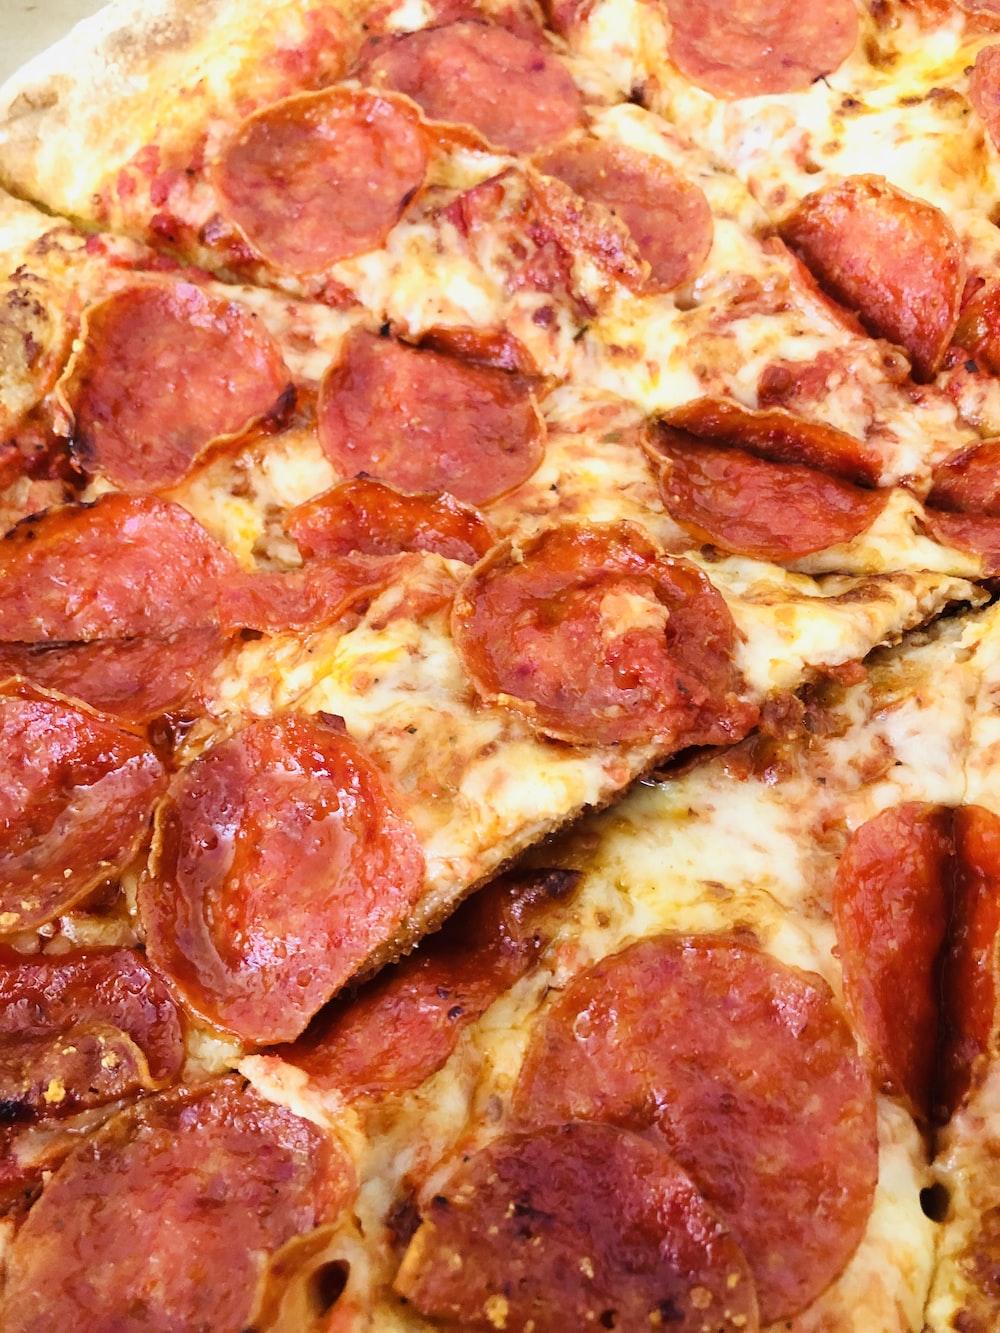 pepperoni pizza on white ceramic plate